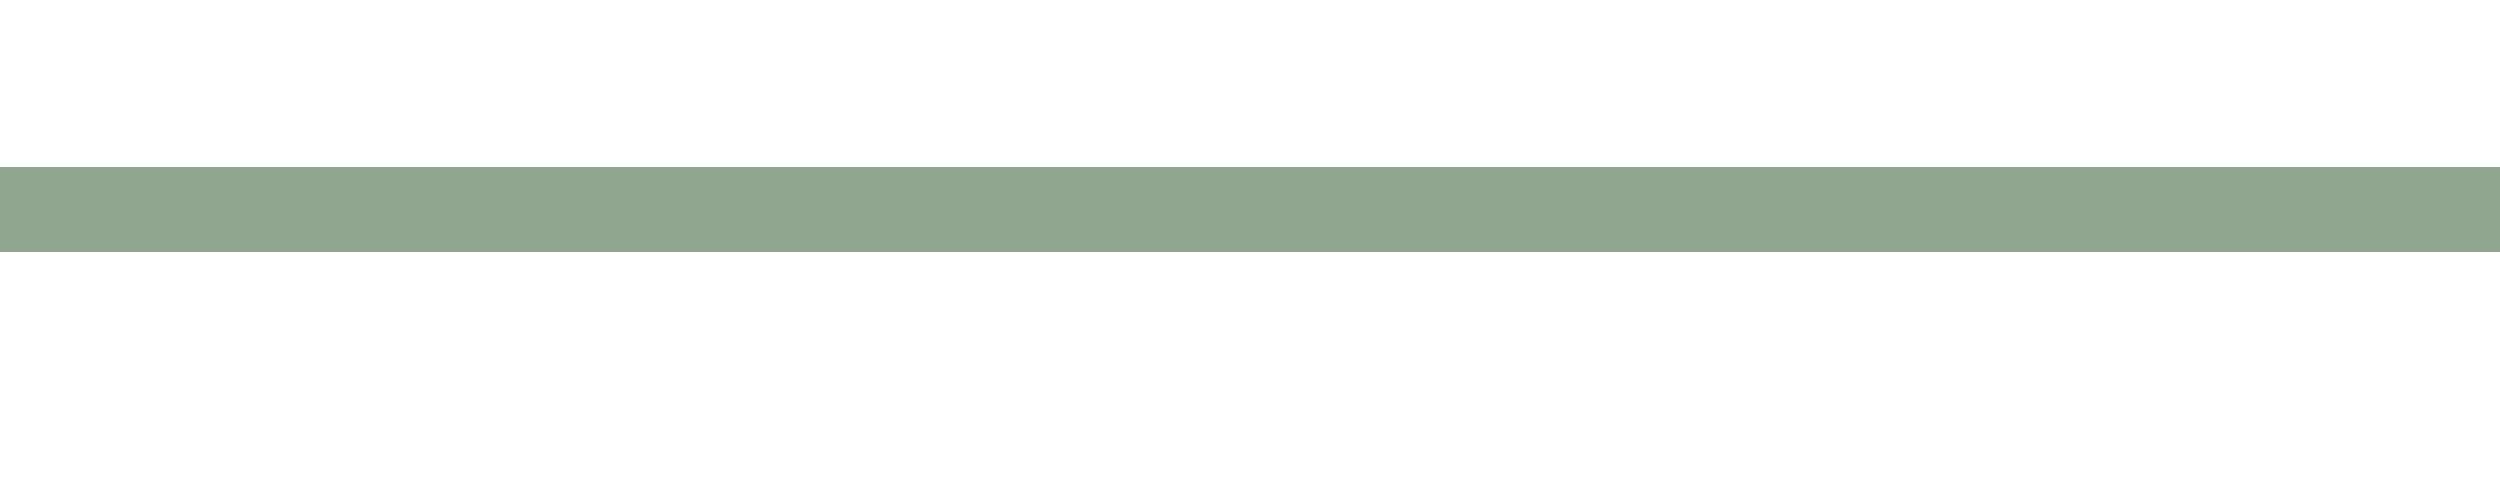 green stripe.png